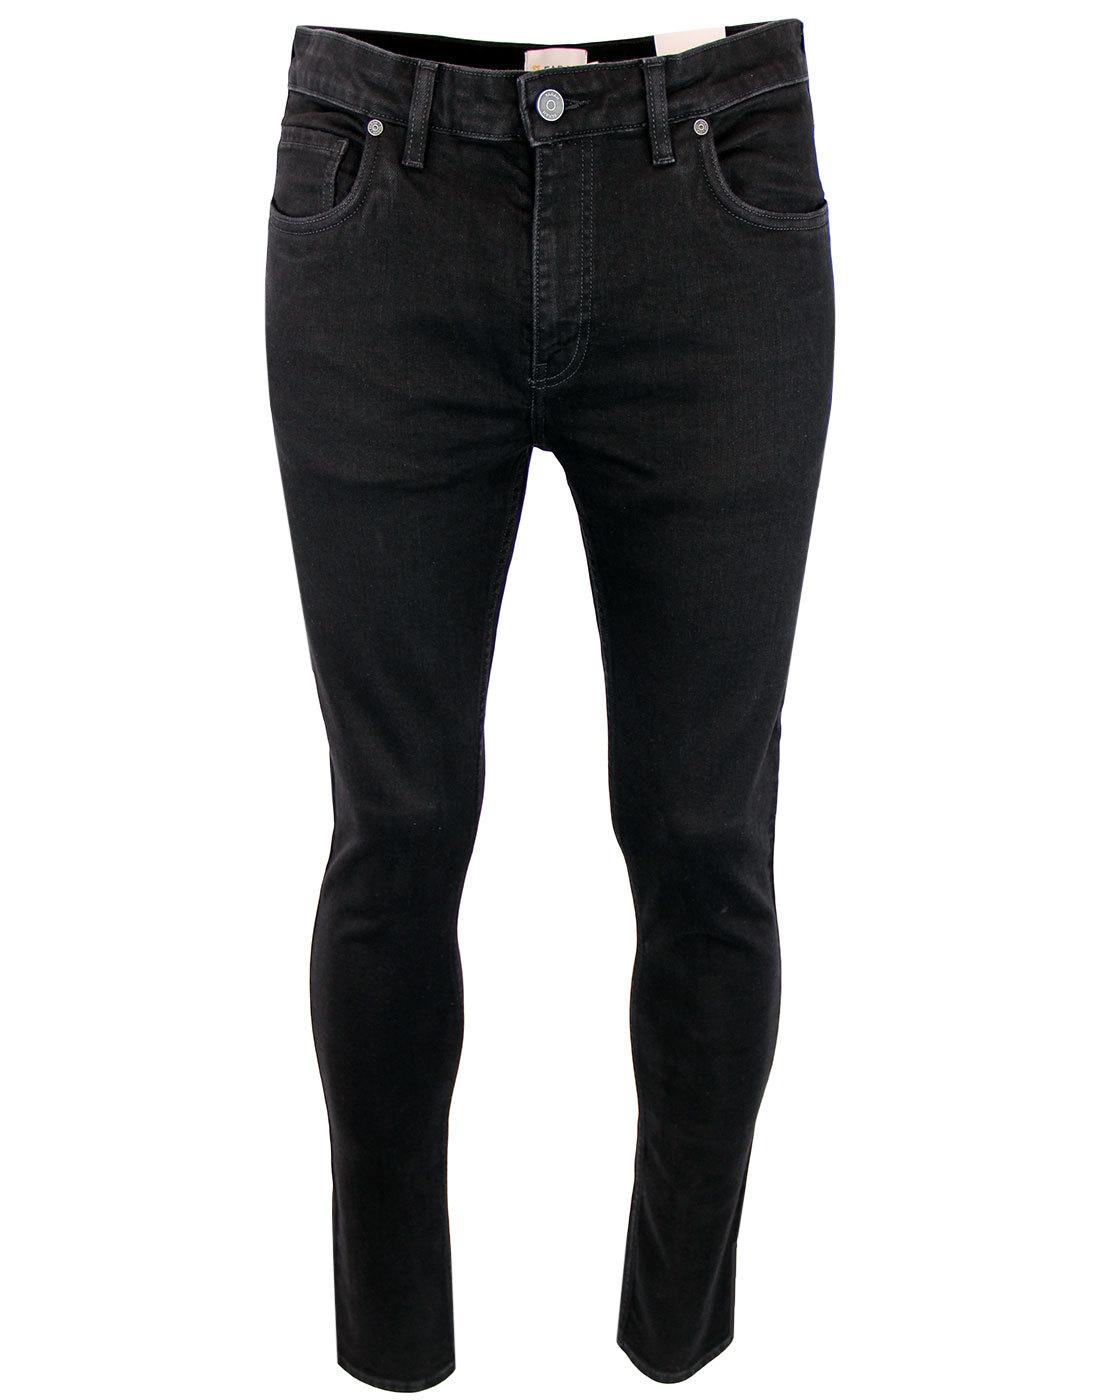 Drake FARAH Mens Indie Soft Stretch Denim Jeans